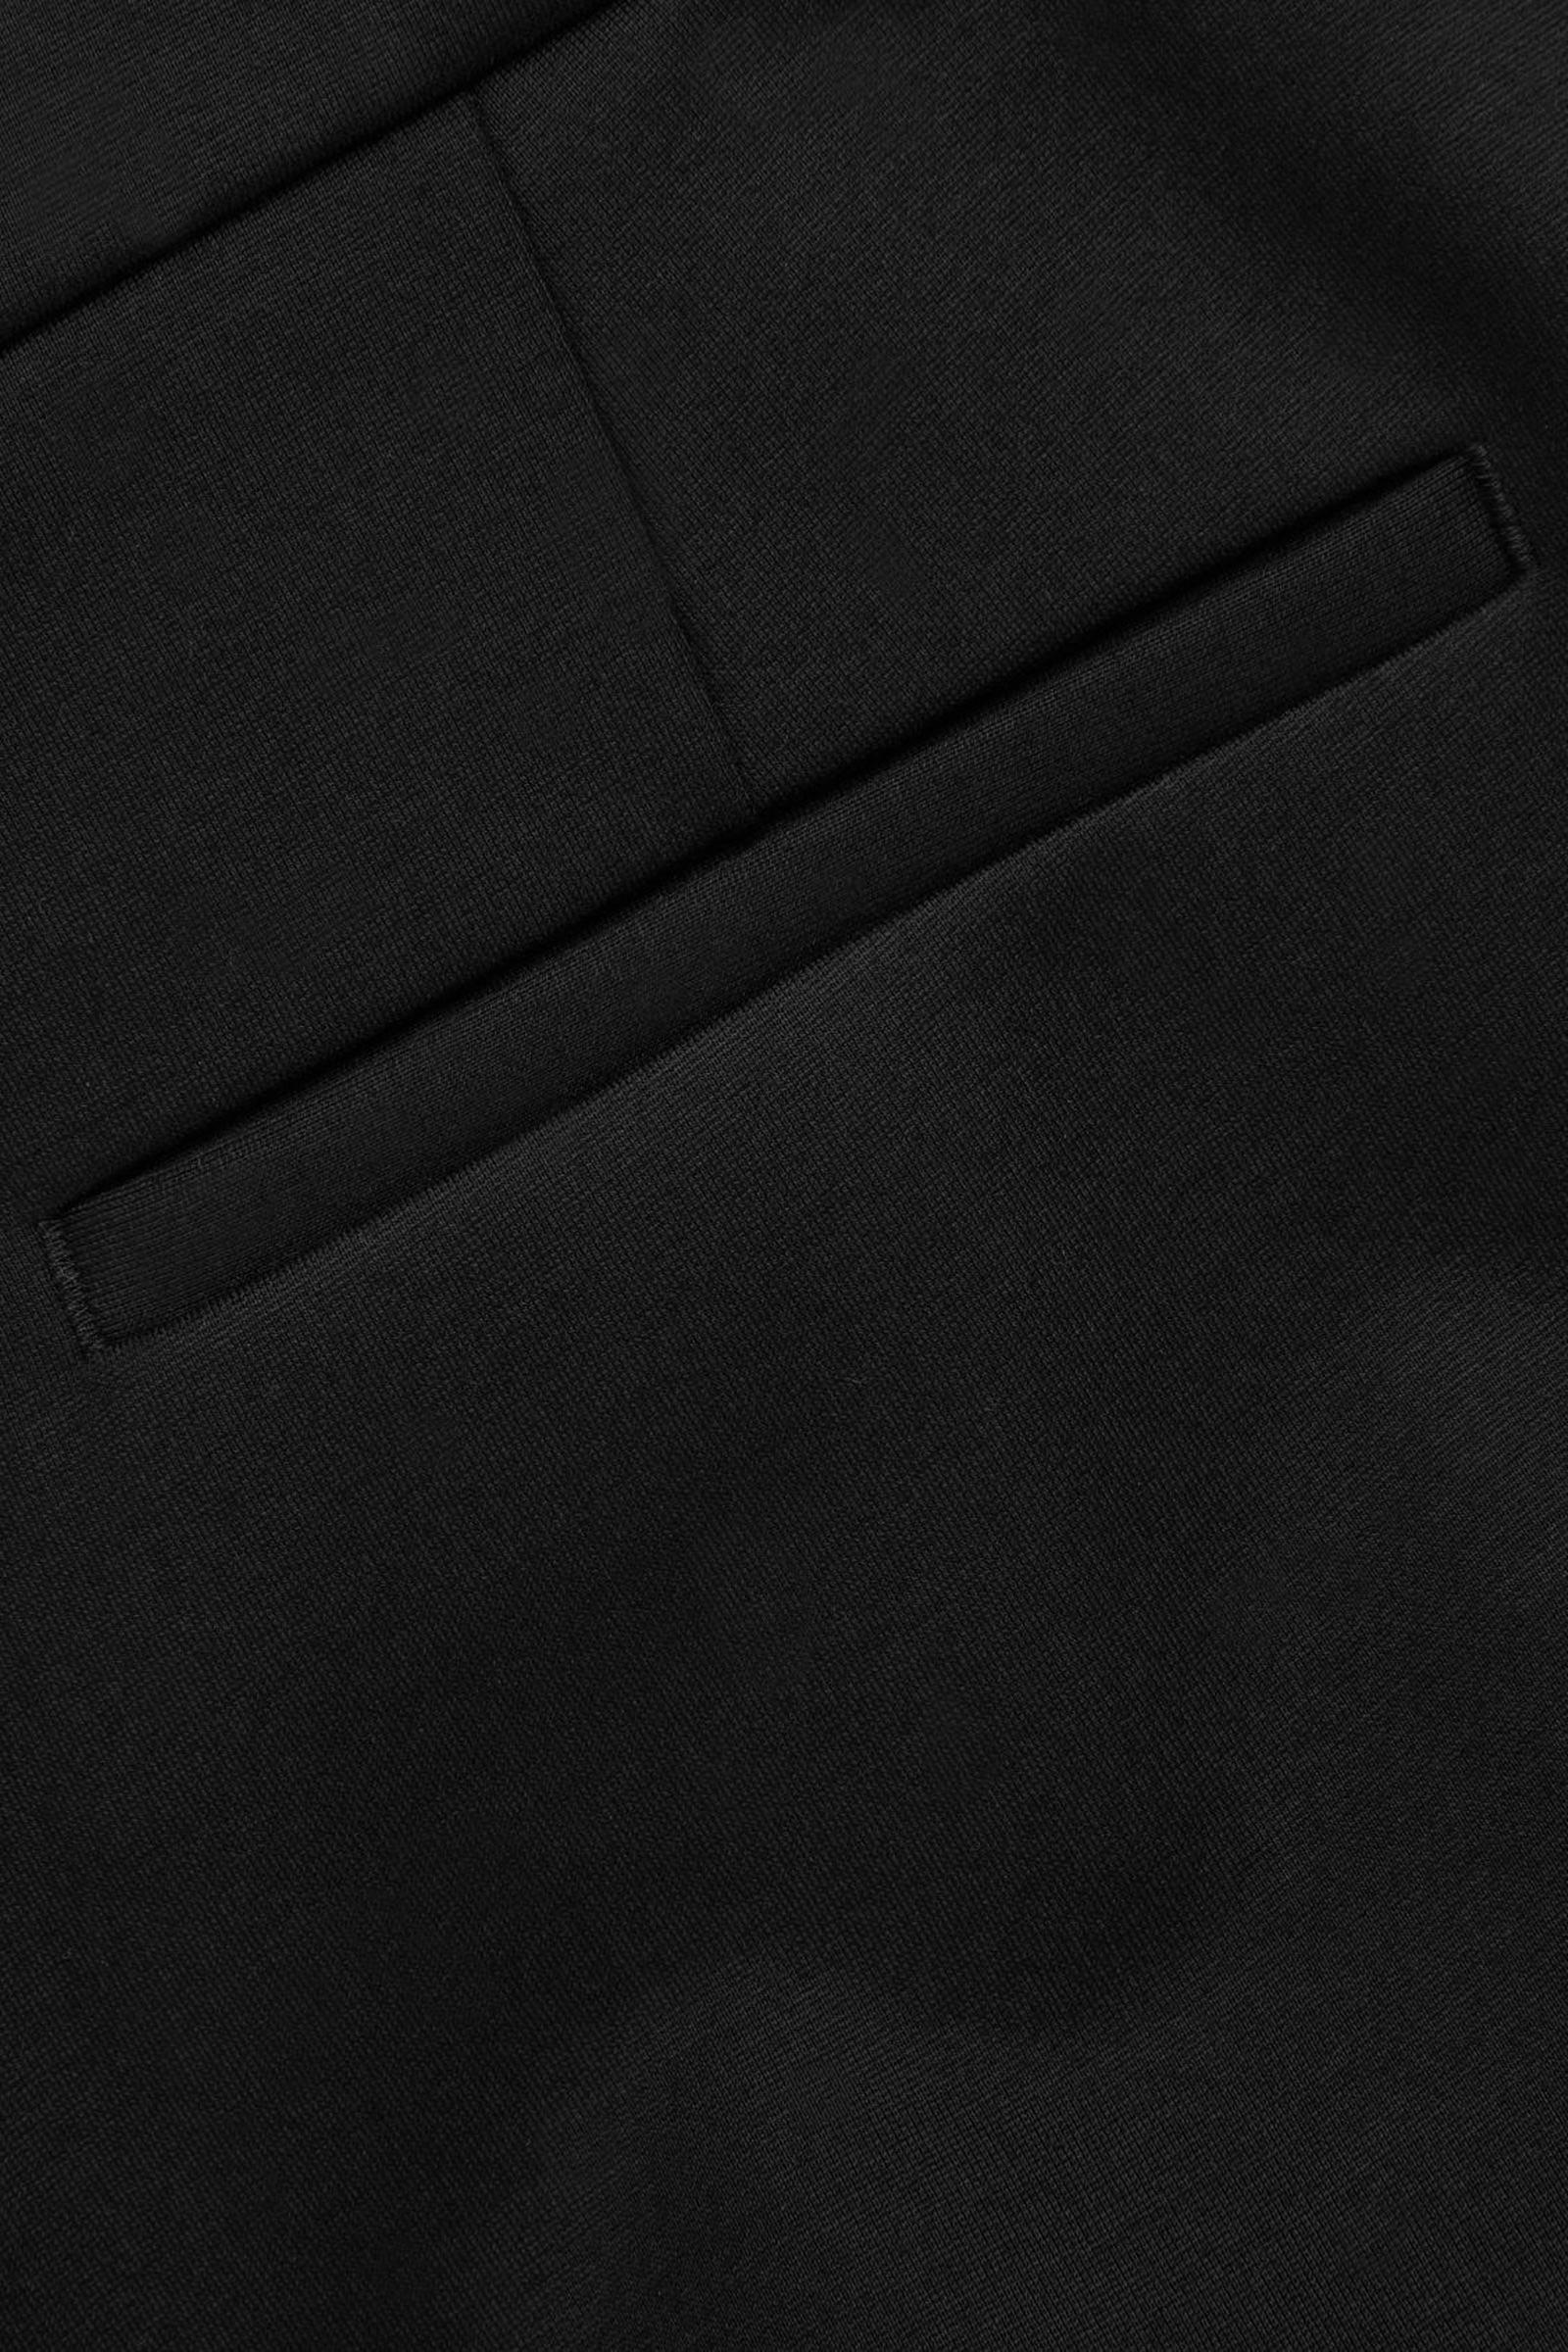 COS 집 헴 슬림 트라우저의 블랙컬러 Detail입니다.